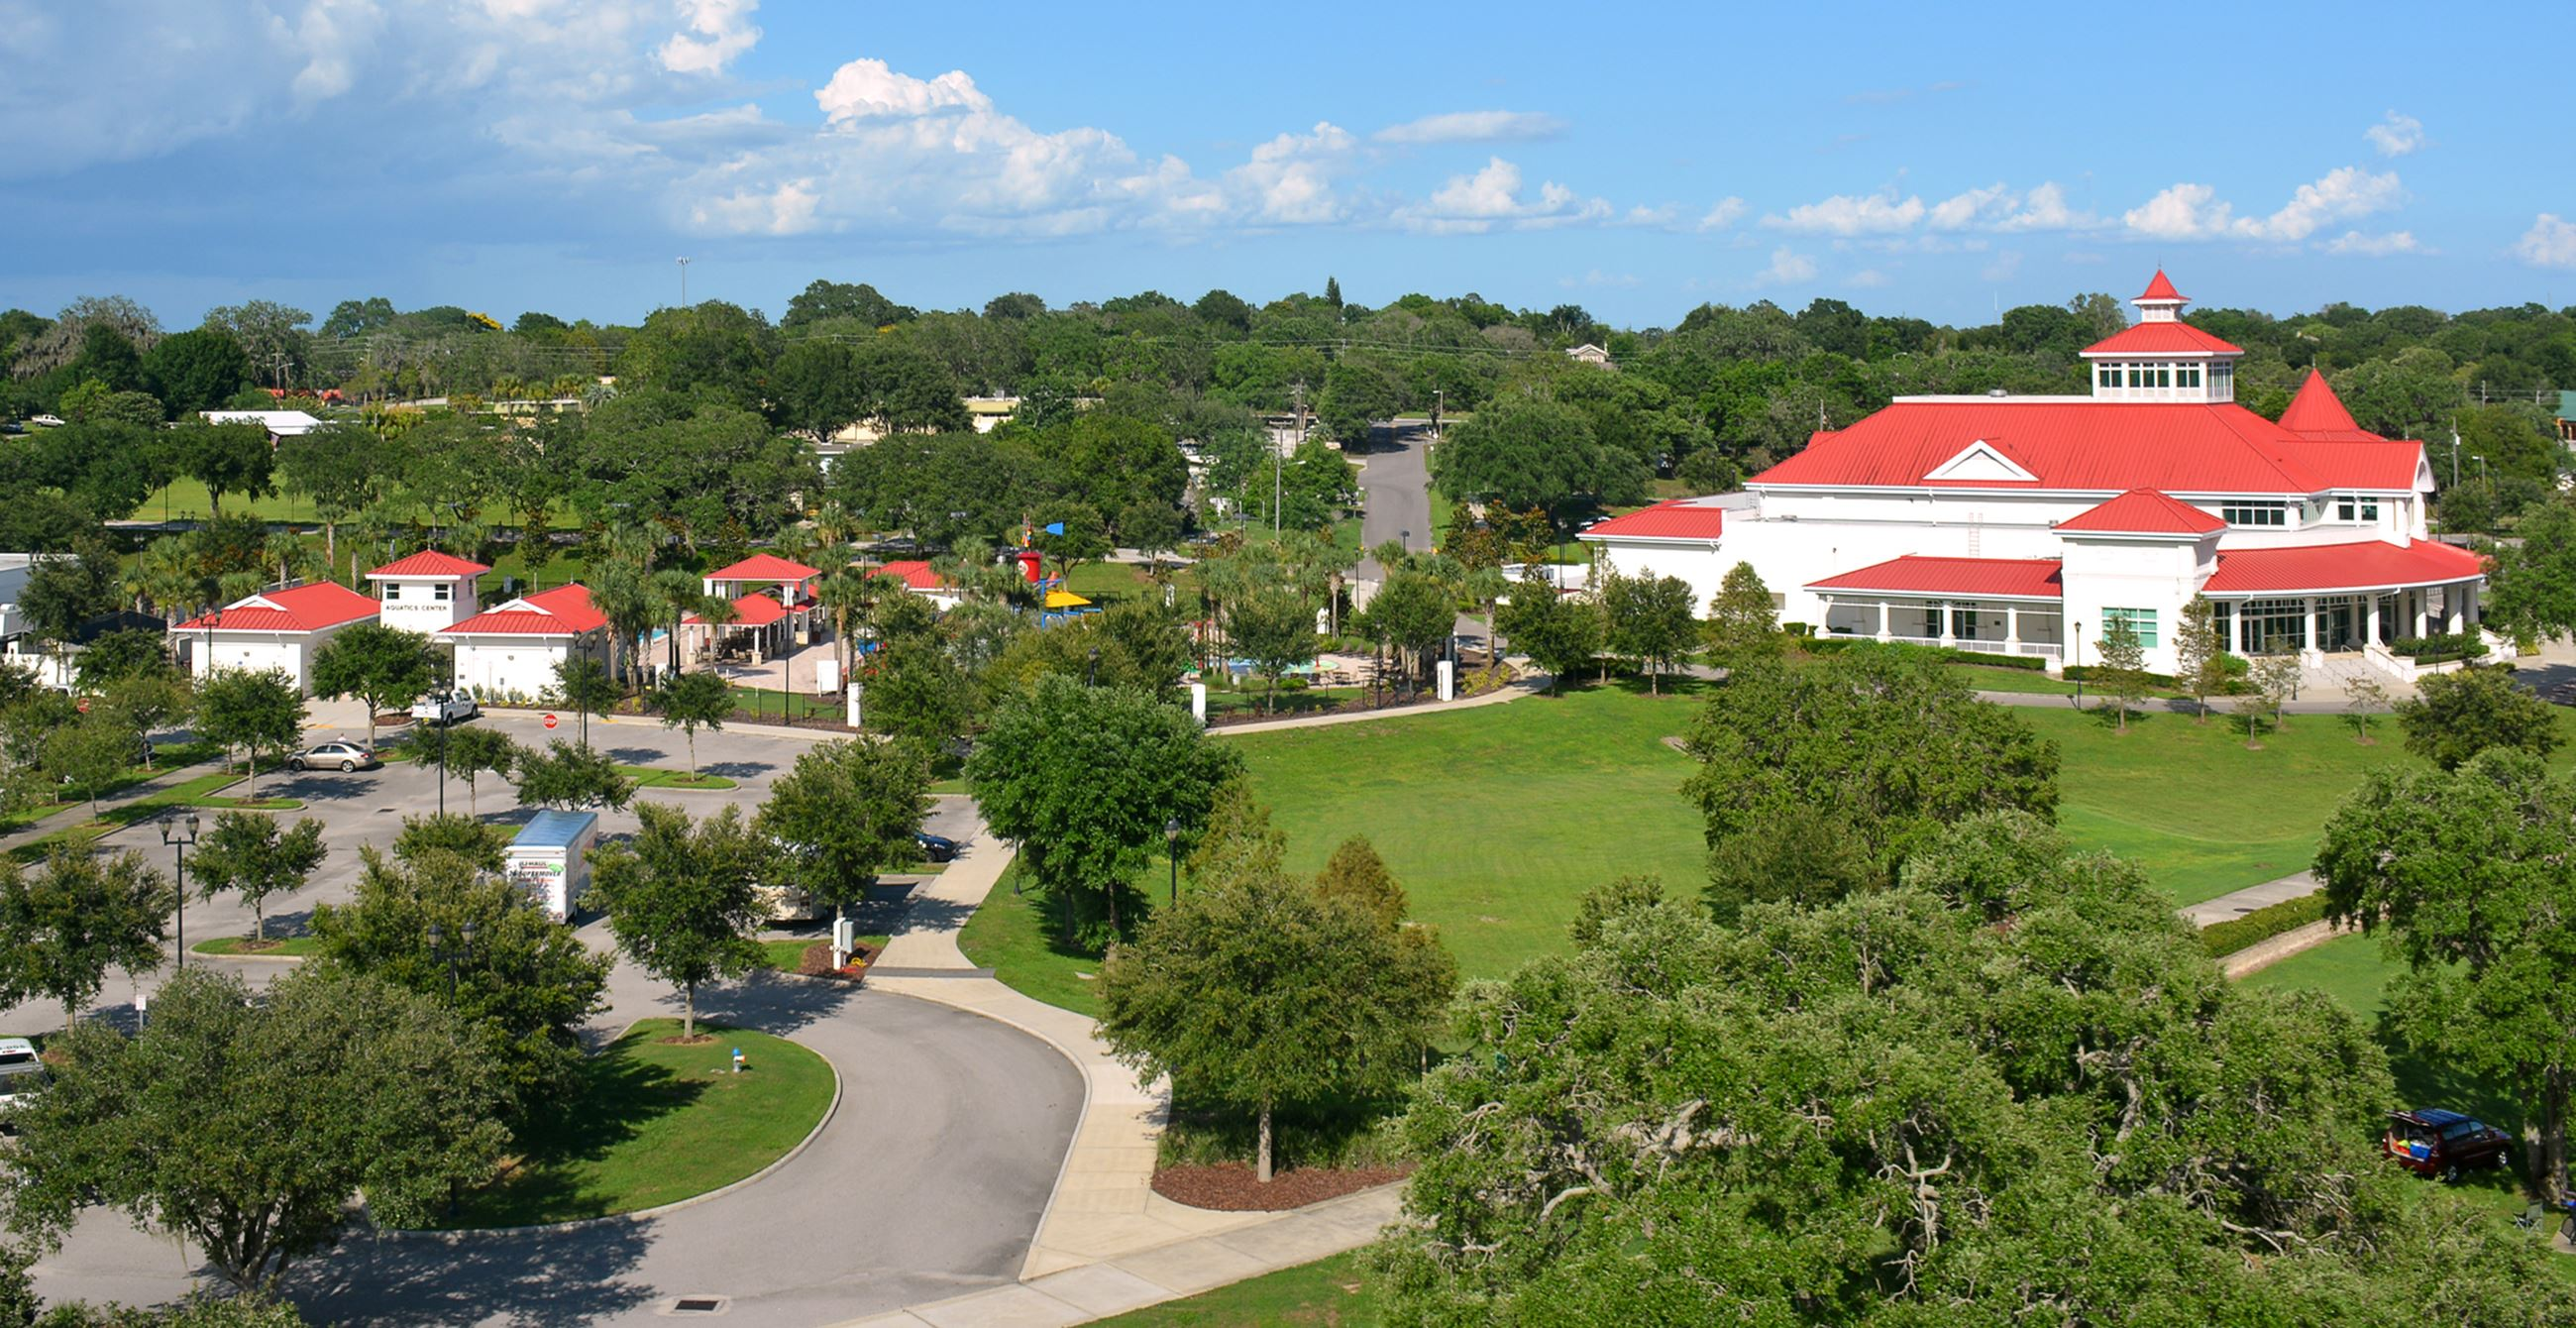 Marvelous Lake Eva Event Center Haines City Fl Download Free Architecture Designs Scobabritishbridgeorg